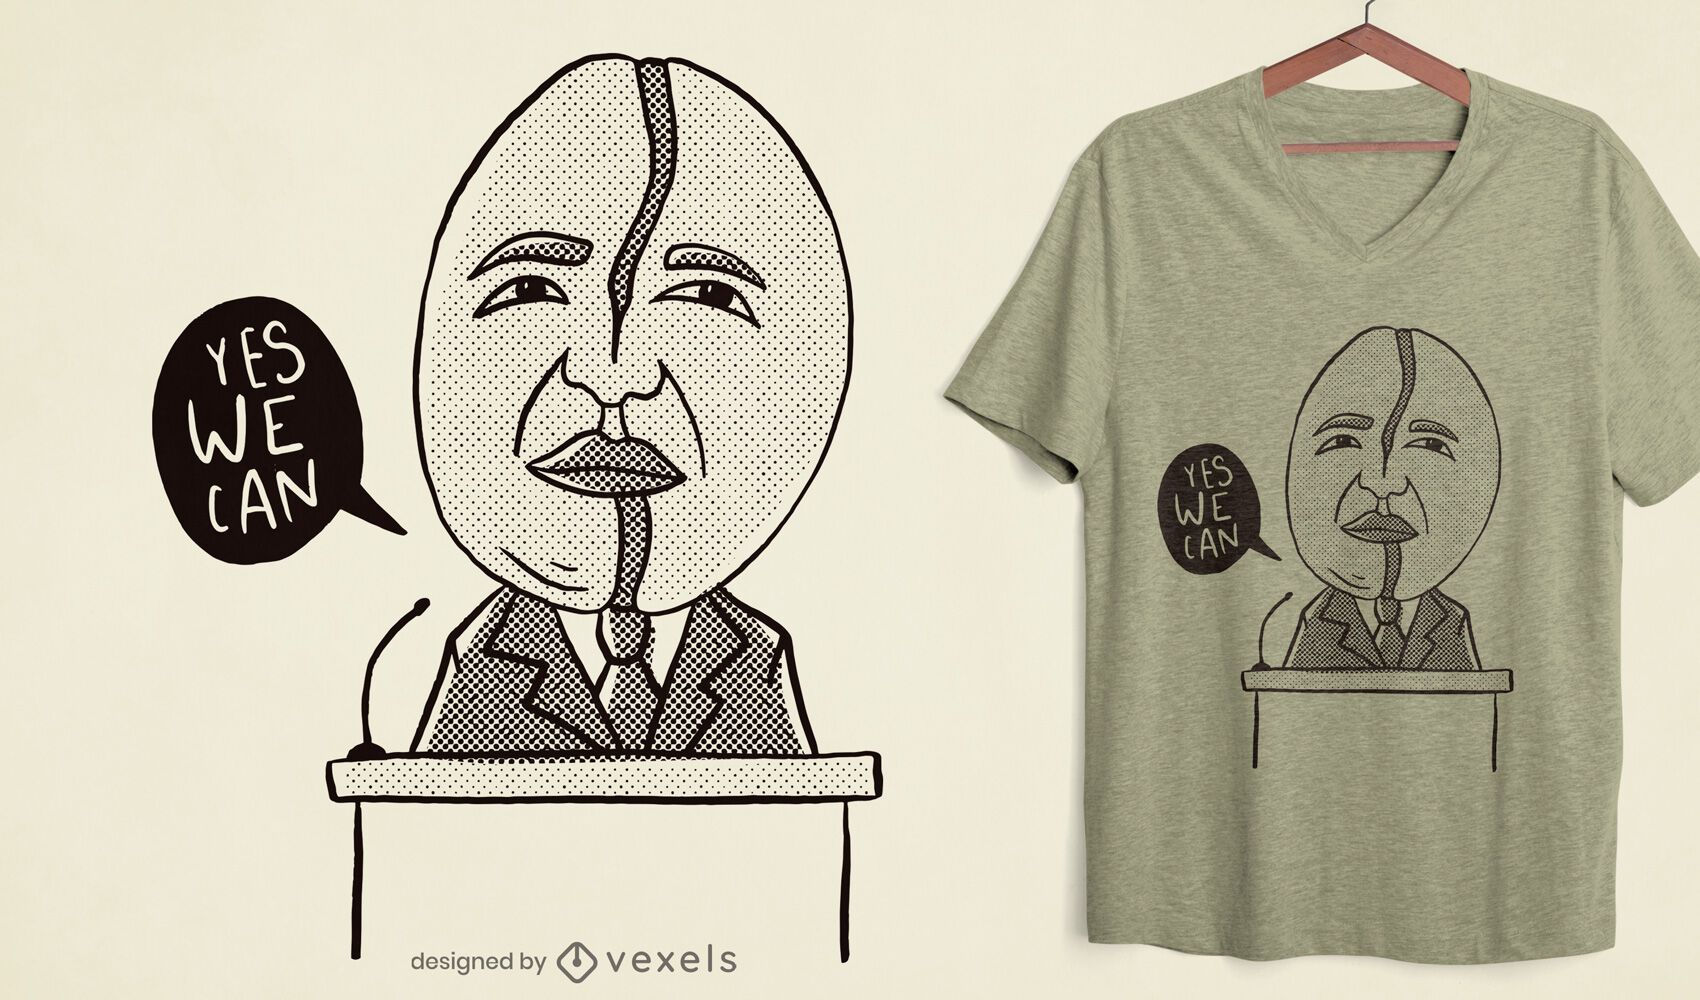 Dise?o de camiseta de Obama en grano de caf?